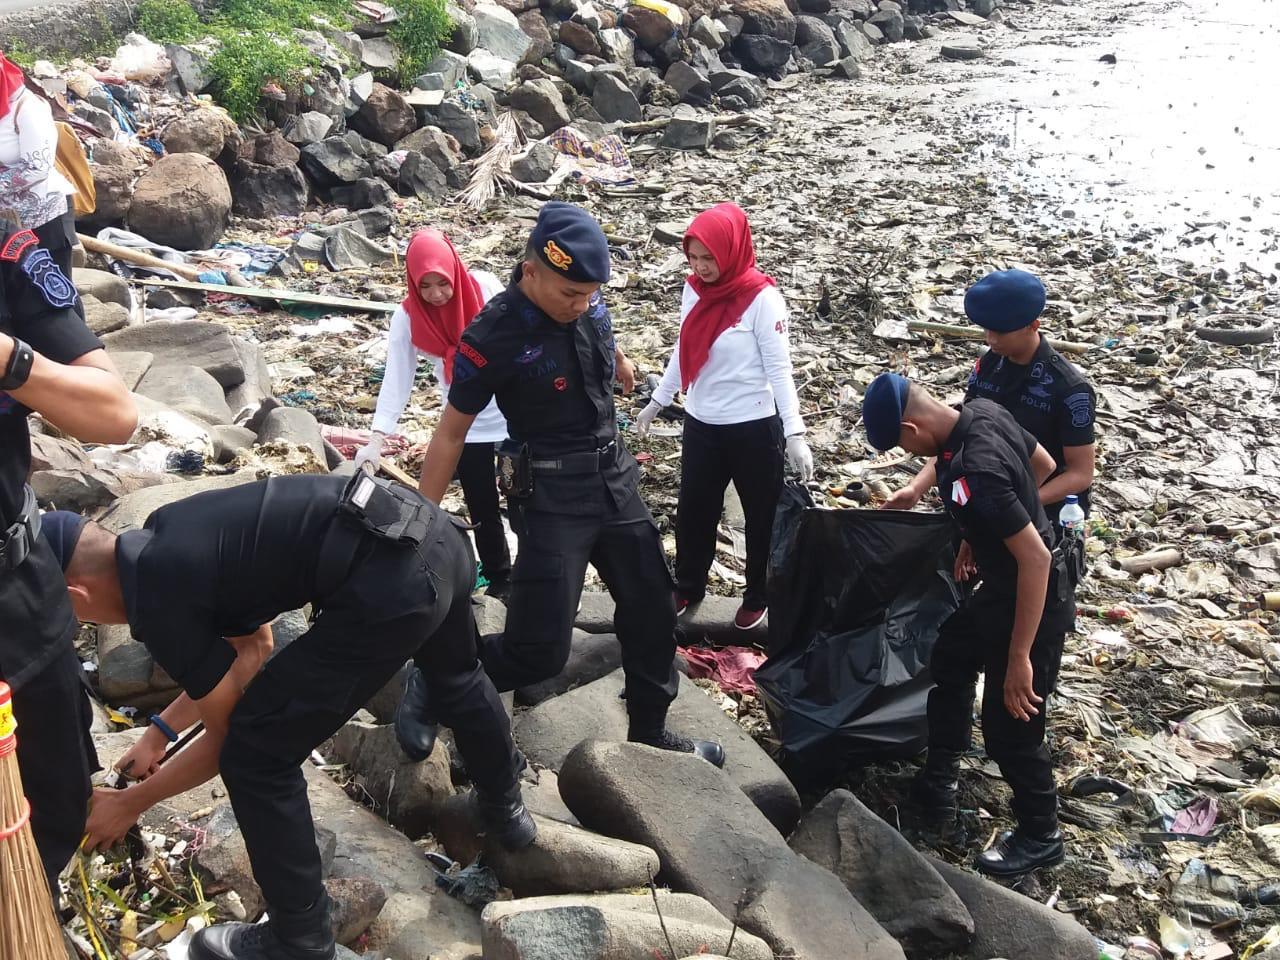 Begini Upaya Pengurus Bhayangkari Ranting Yon C Pelopor Brimob Ciptakan Indonesia Bersih dan Laut Bebas Sampah Plastik